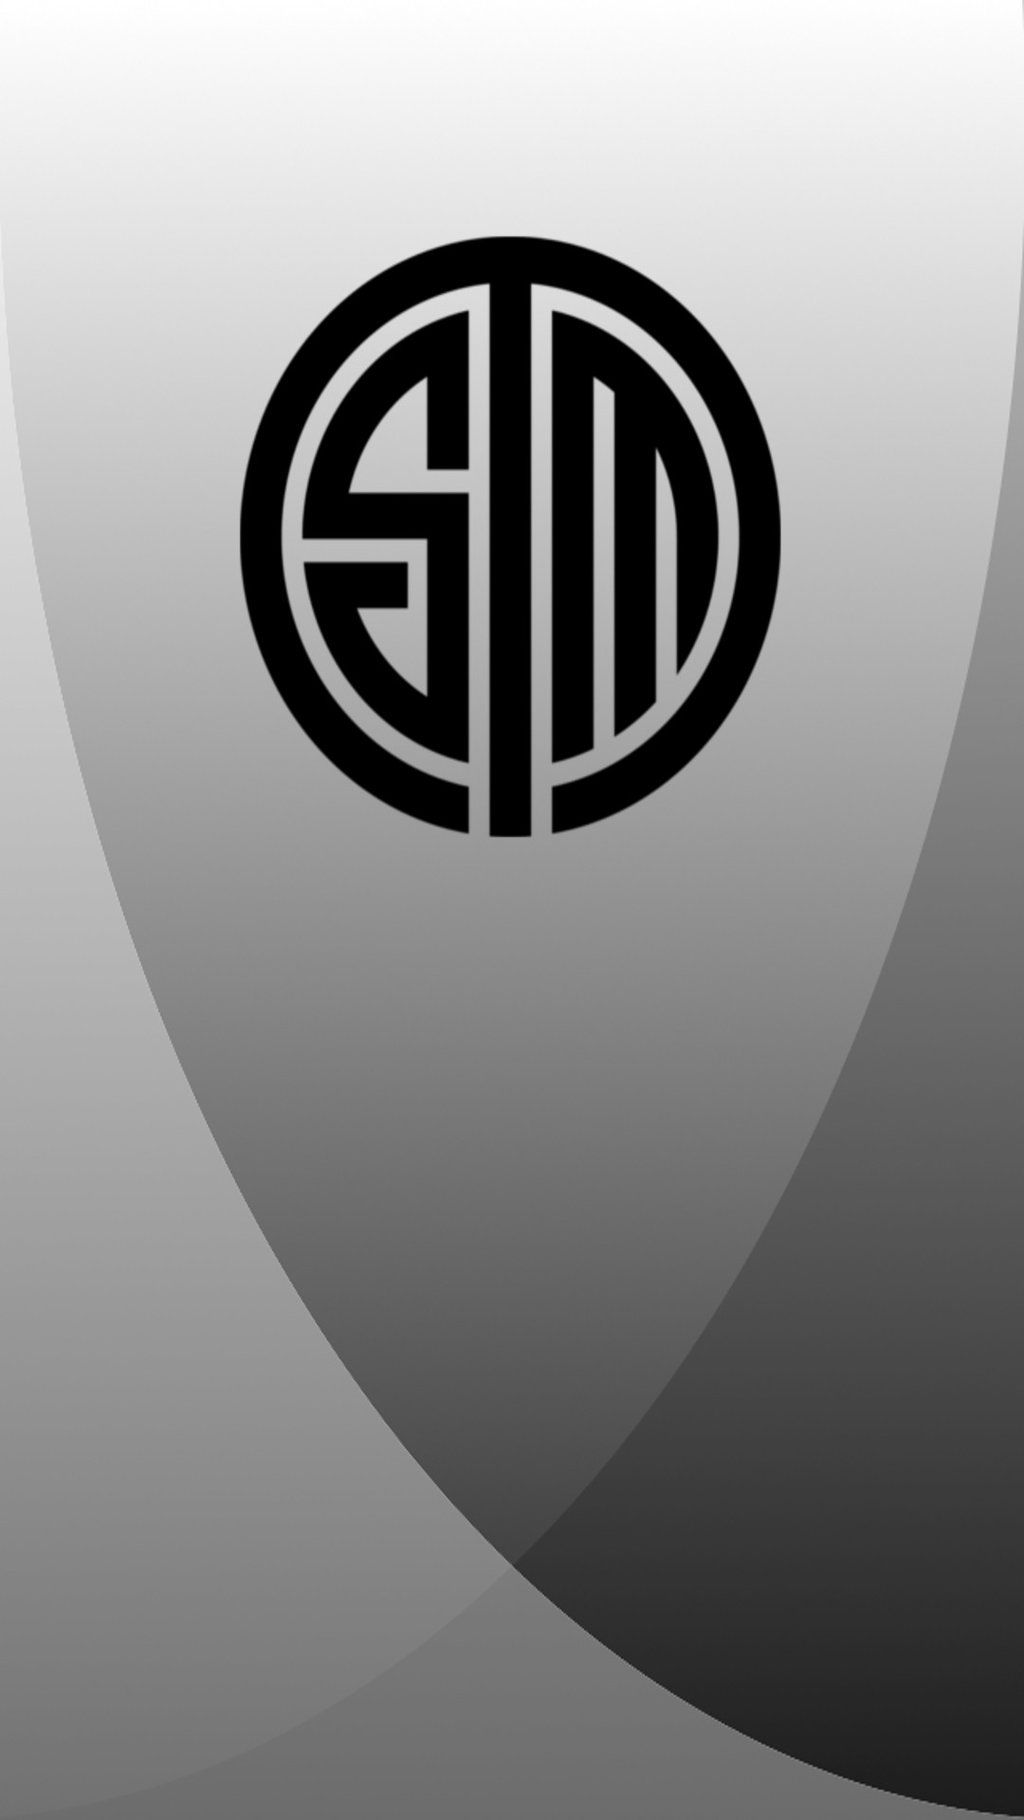 Na Lcs Smartphone Backgrounds Tsm 1080x1920 By Kingfr0st On League Of Legends Logo Tsm Logo Design Services